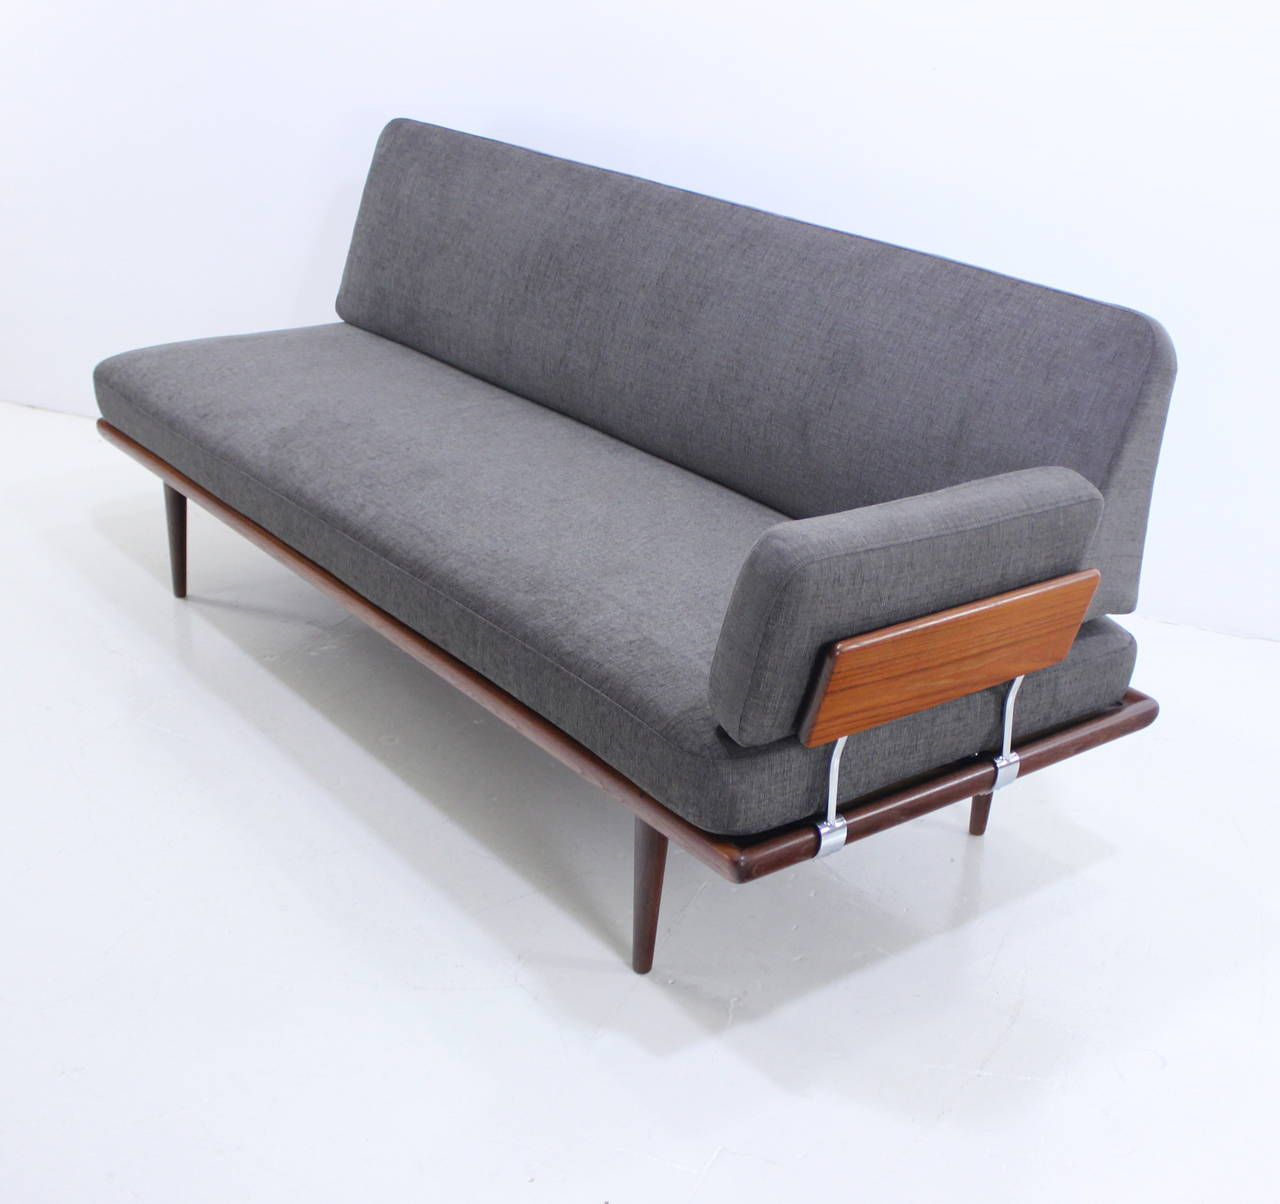 Exceptional Danish Modern Teak Seating Group Designed By Peter Hvidt At 1stdibs